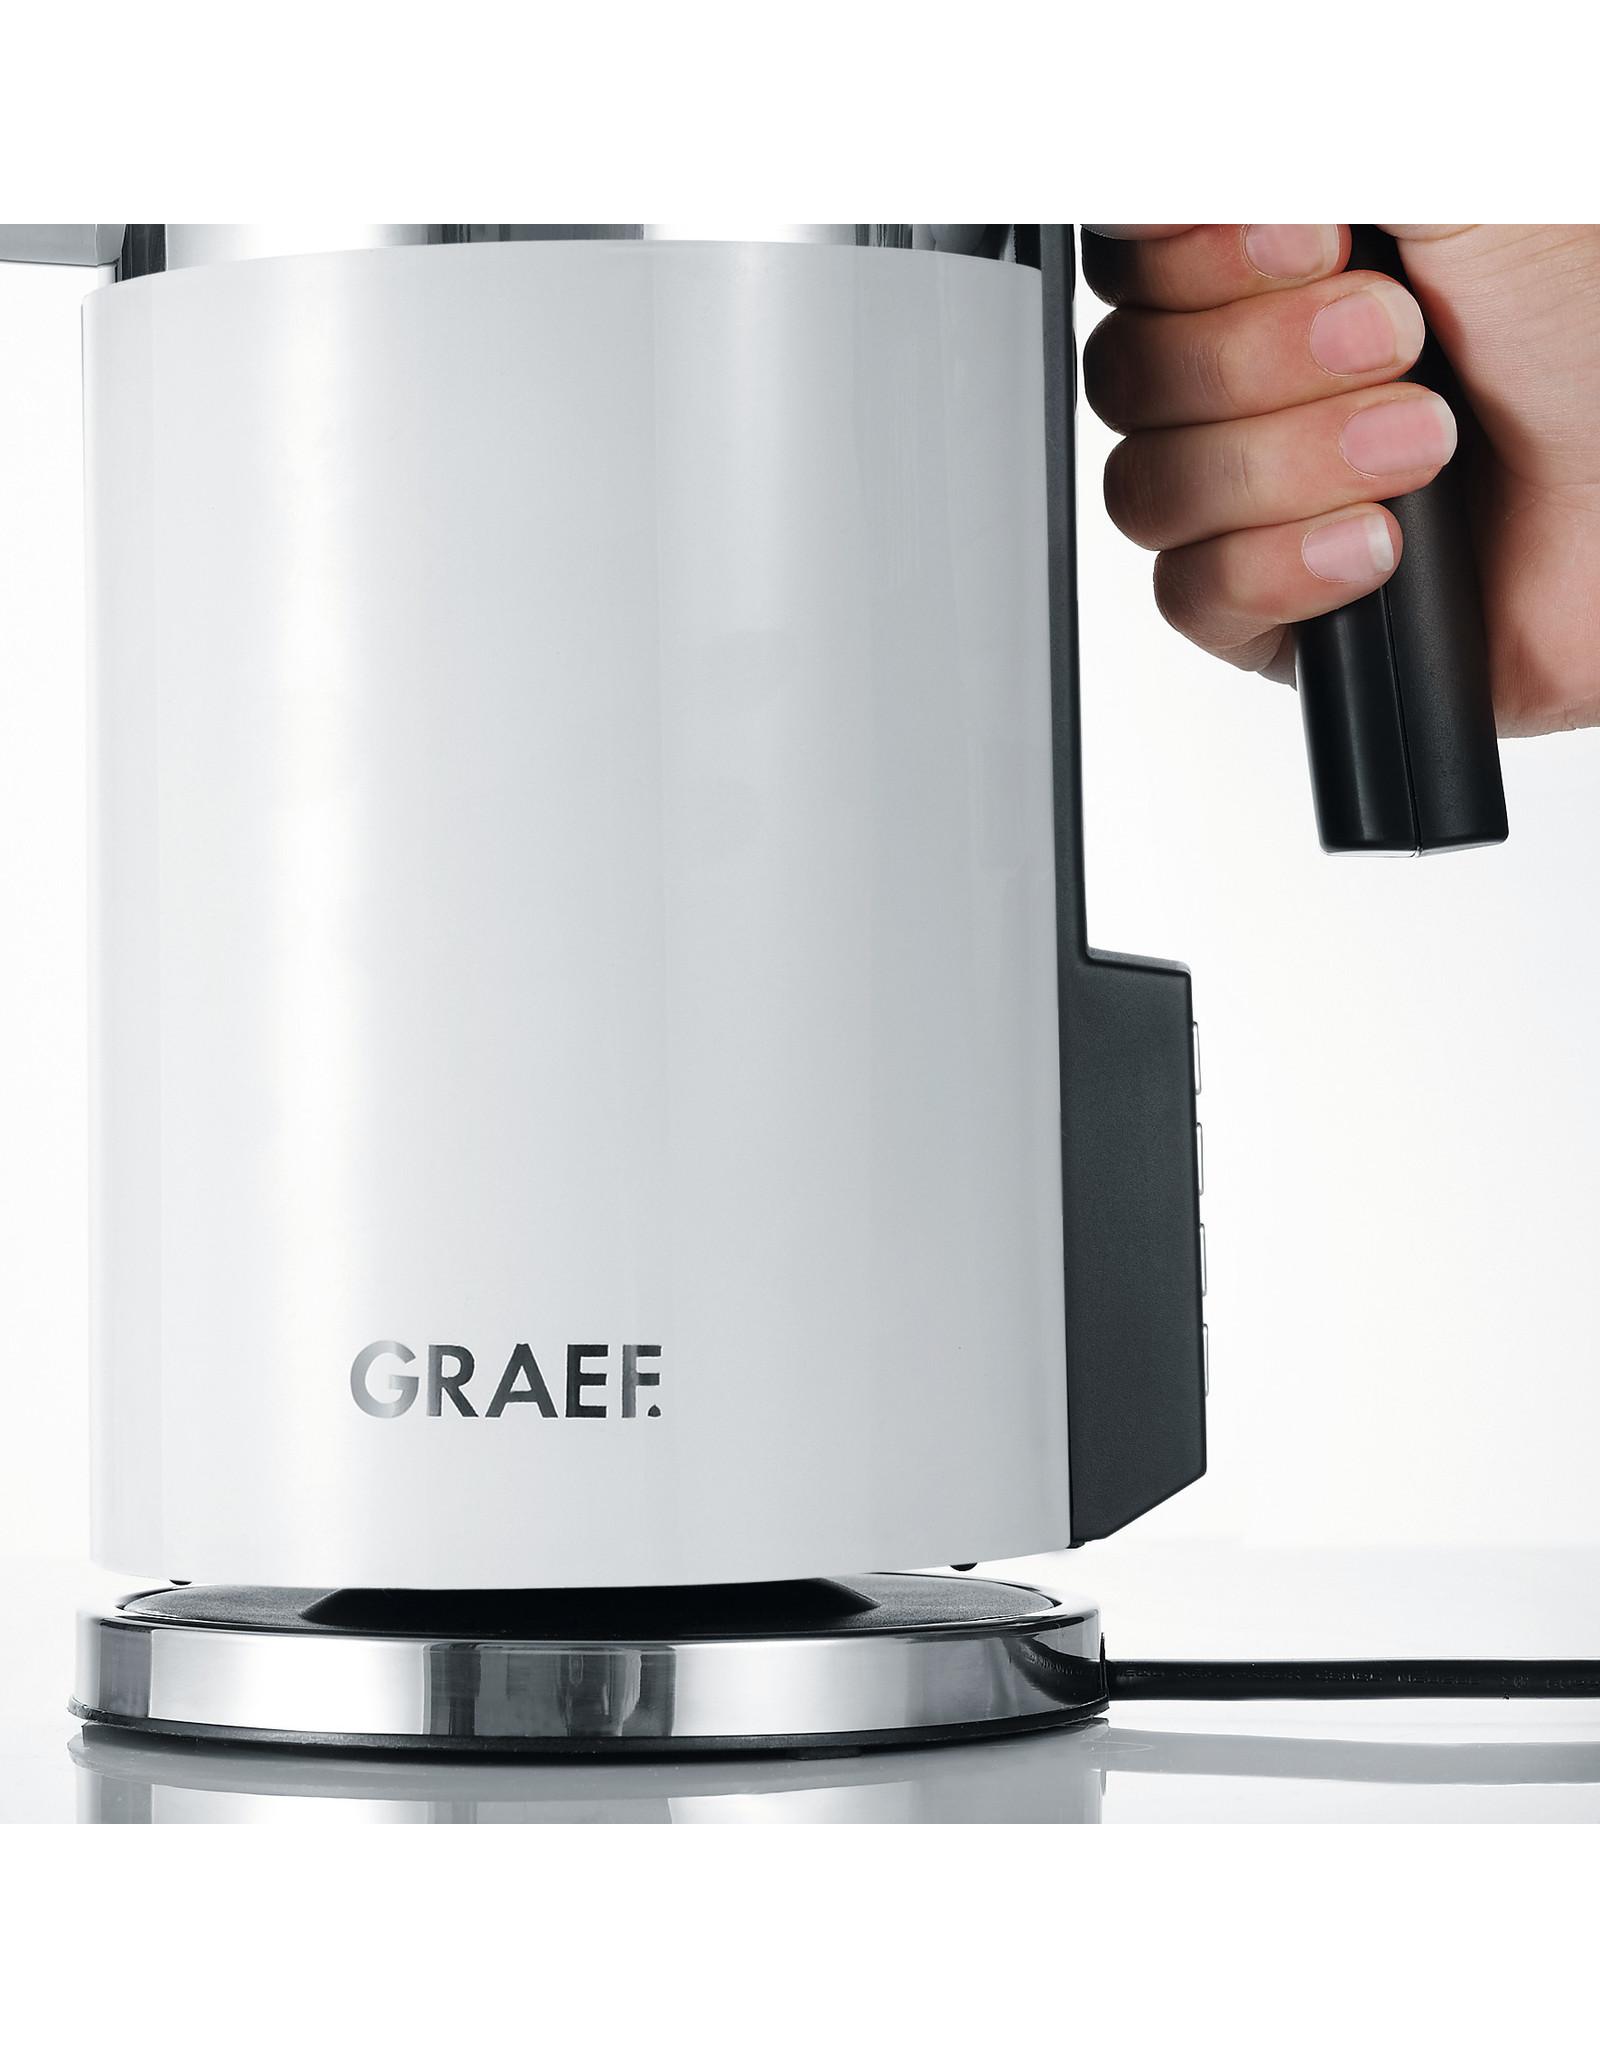 GRAEF GRAEF 45701 WATERKOKER 1.5LTR WK701 WIT  VARIABEL